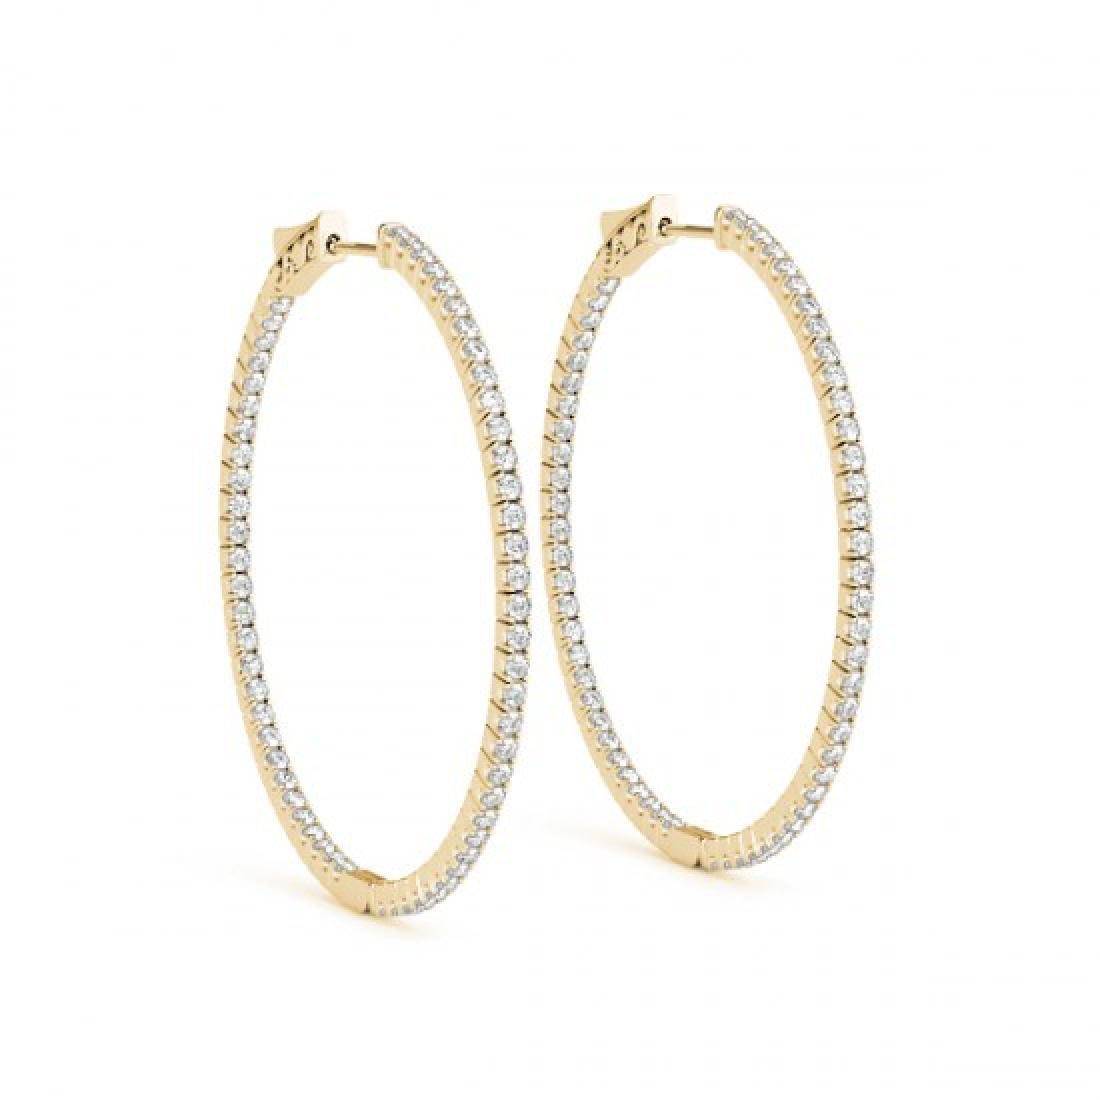 2 CTW Diamond VS/SI Certified 52 Mm Hoop Earrings 14K - 2